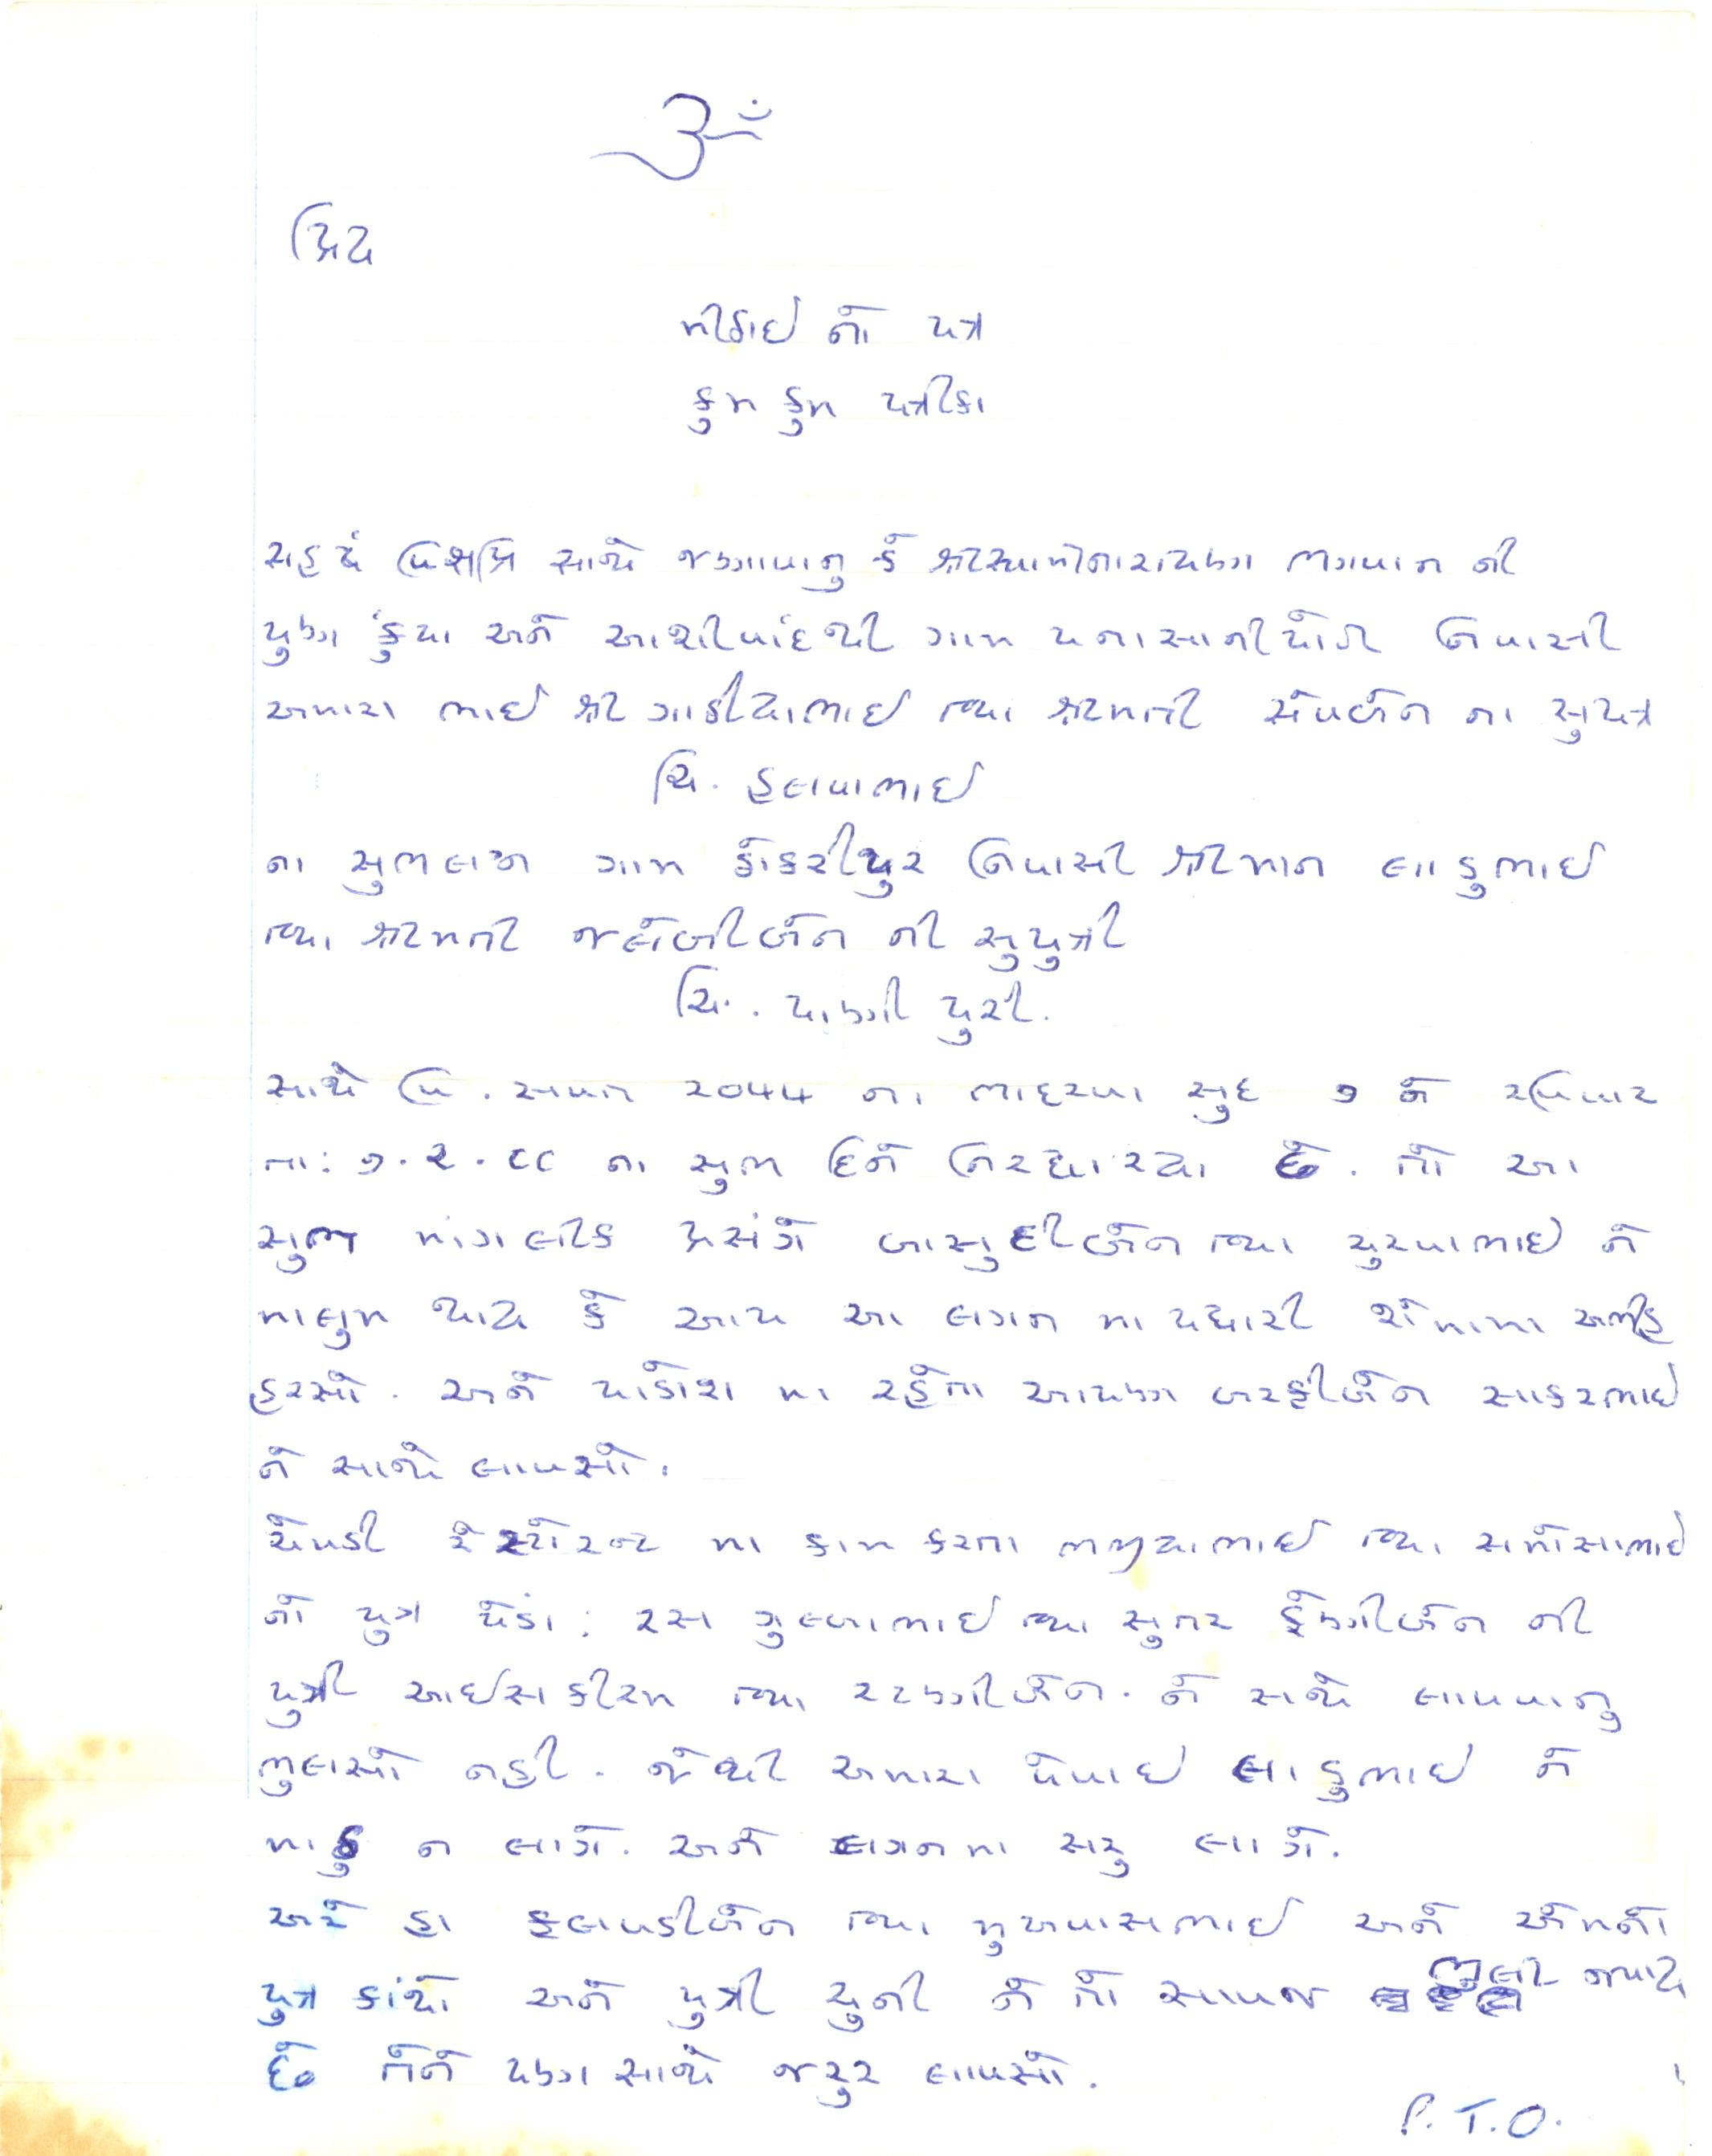 021 Mothers Love Essay My Mother Writing I On In English Marathi Sca Hindi Phenomenal Wikipedia Tamil Gujarati Full